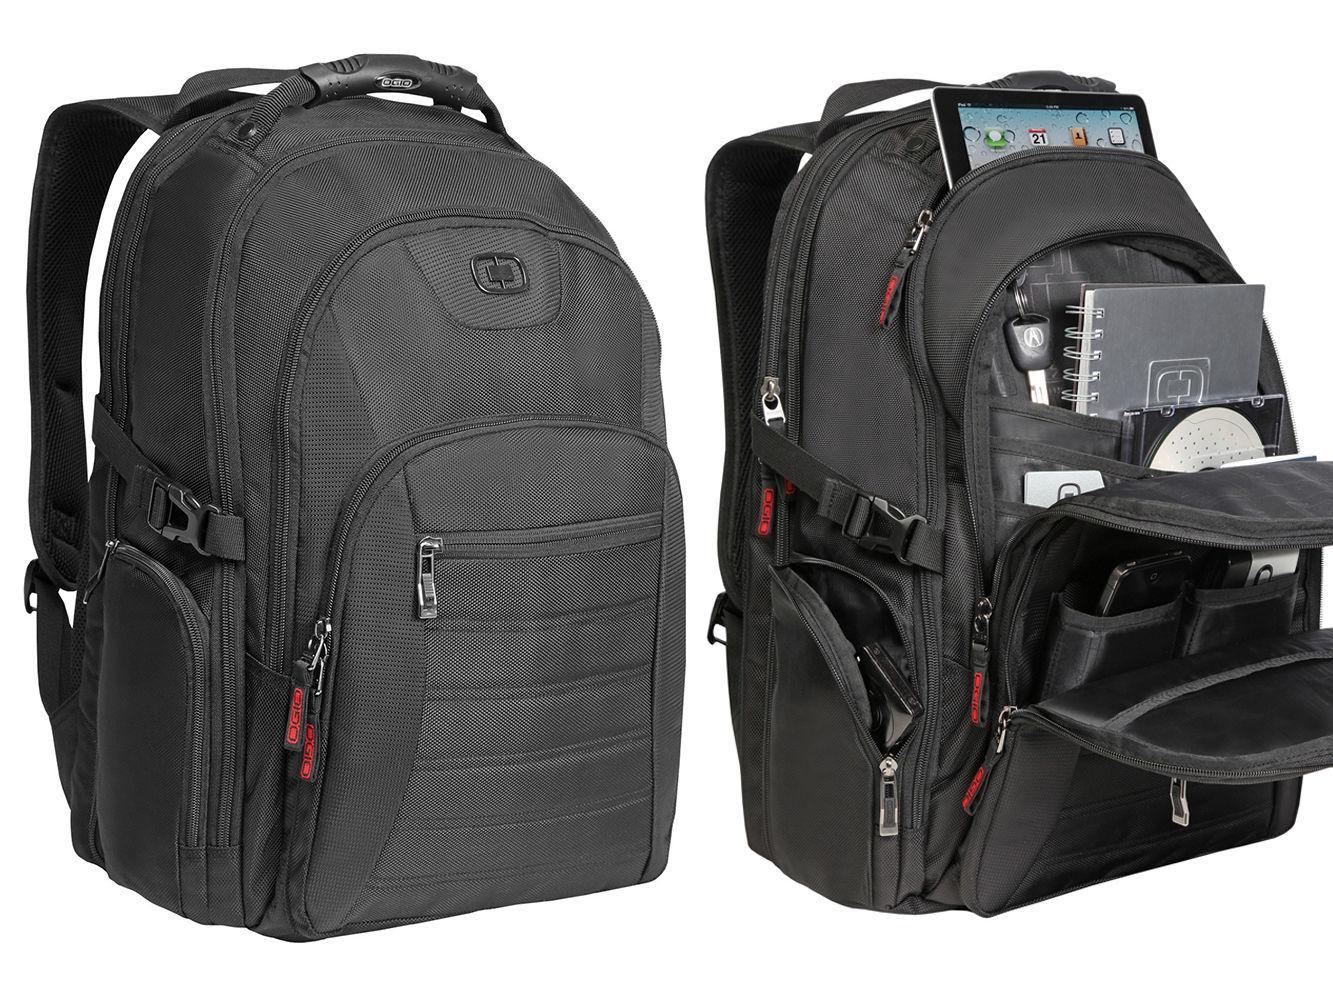 efaac7000bfdf Ogio Urban Black plecak na laptop 17'' /FV/24h - 6715282899 ...